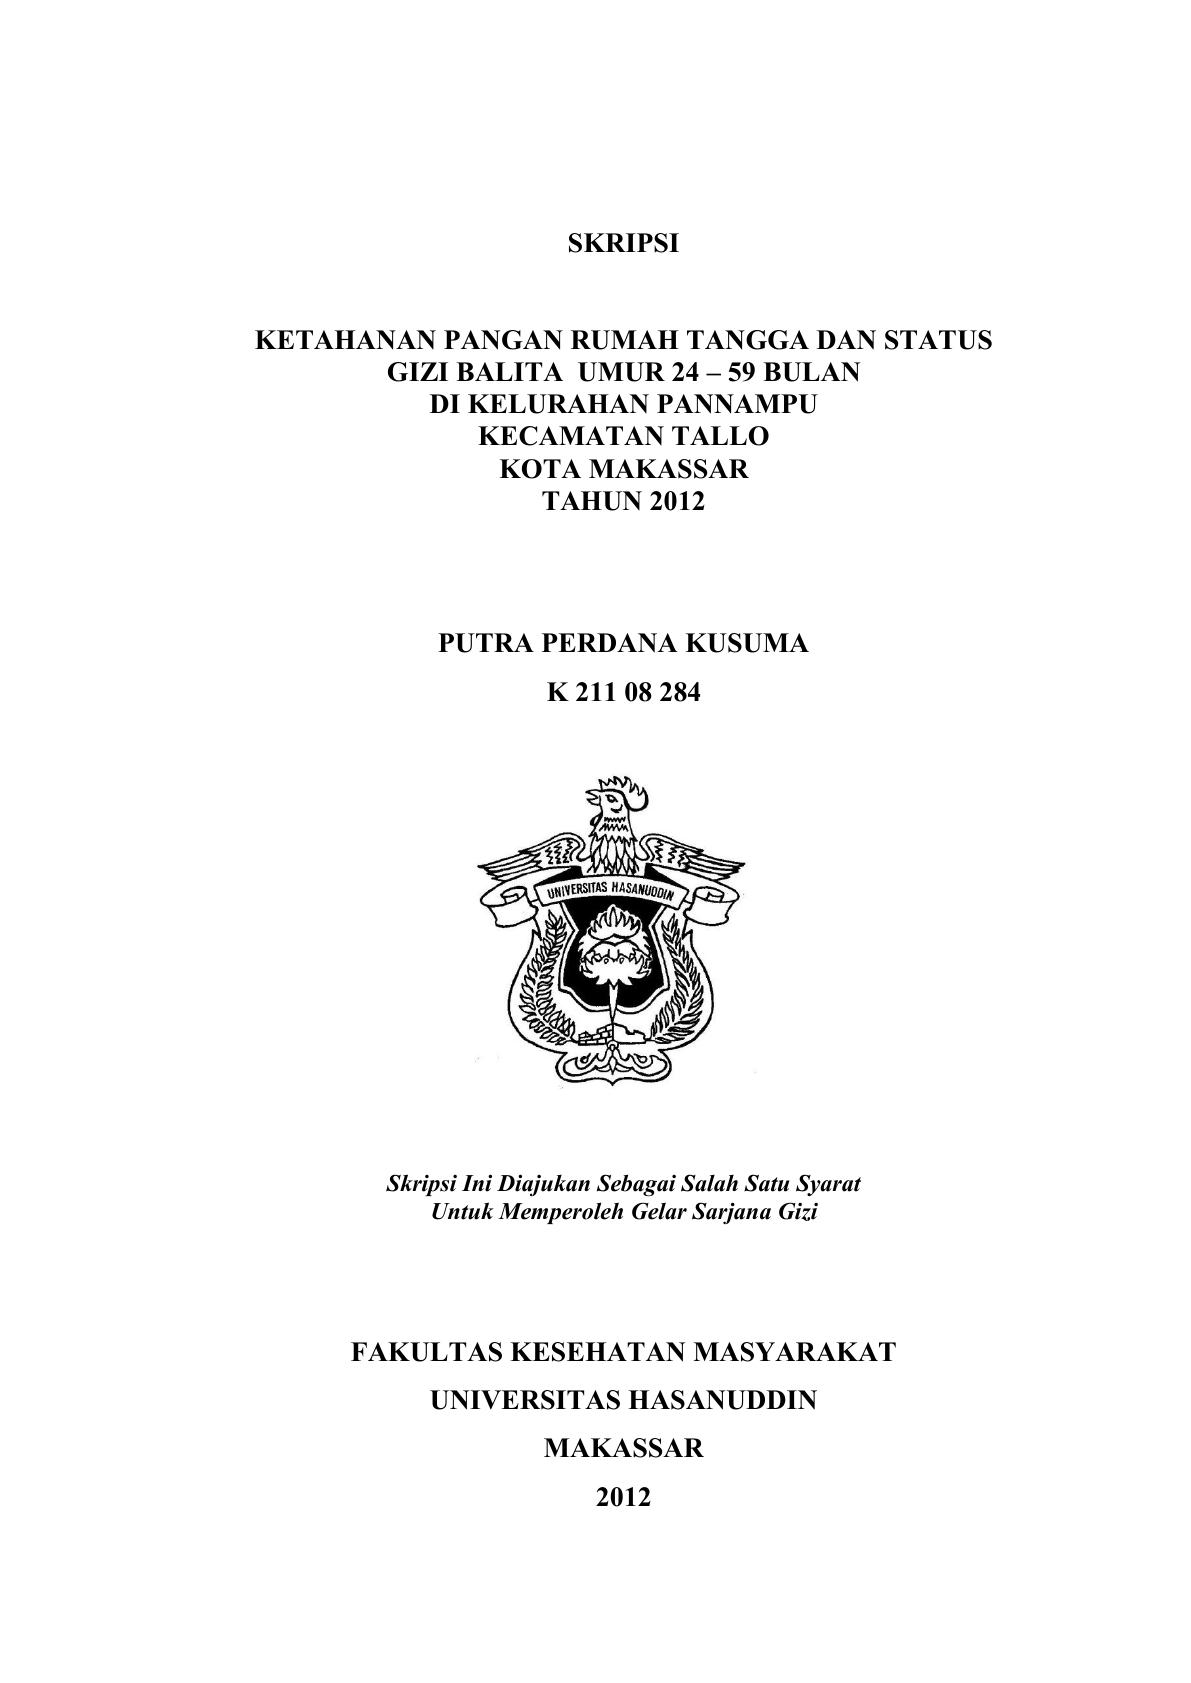 Ketahanan Pangan Rumah Tangga Dan Status Gizi Balita Umur 24 A 59 Bulan Di Kelurahan Pannampu Kecamatan Tallo Kota Makassar Tahun 2012 Putra Perdana Kusuma Perpustakaan Universitas Hasanuddin